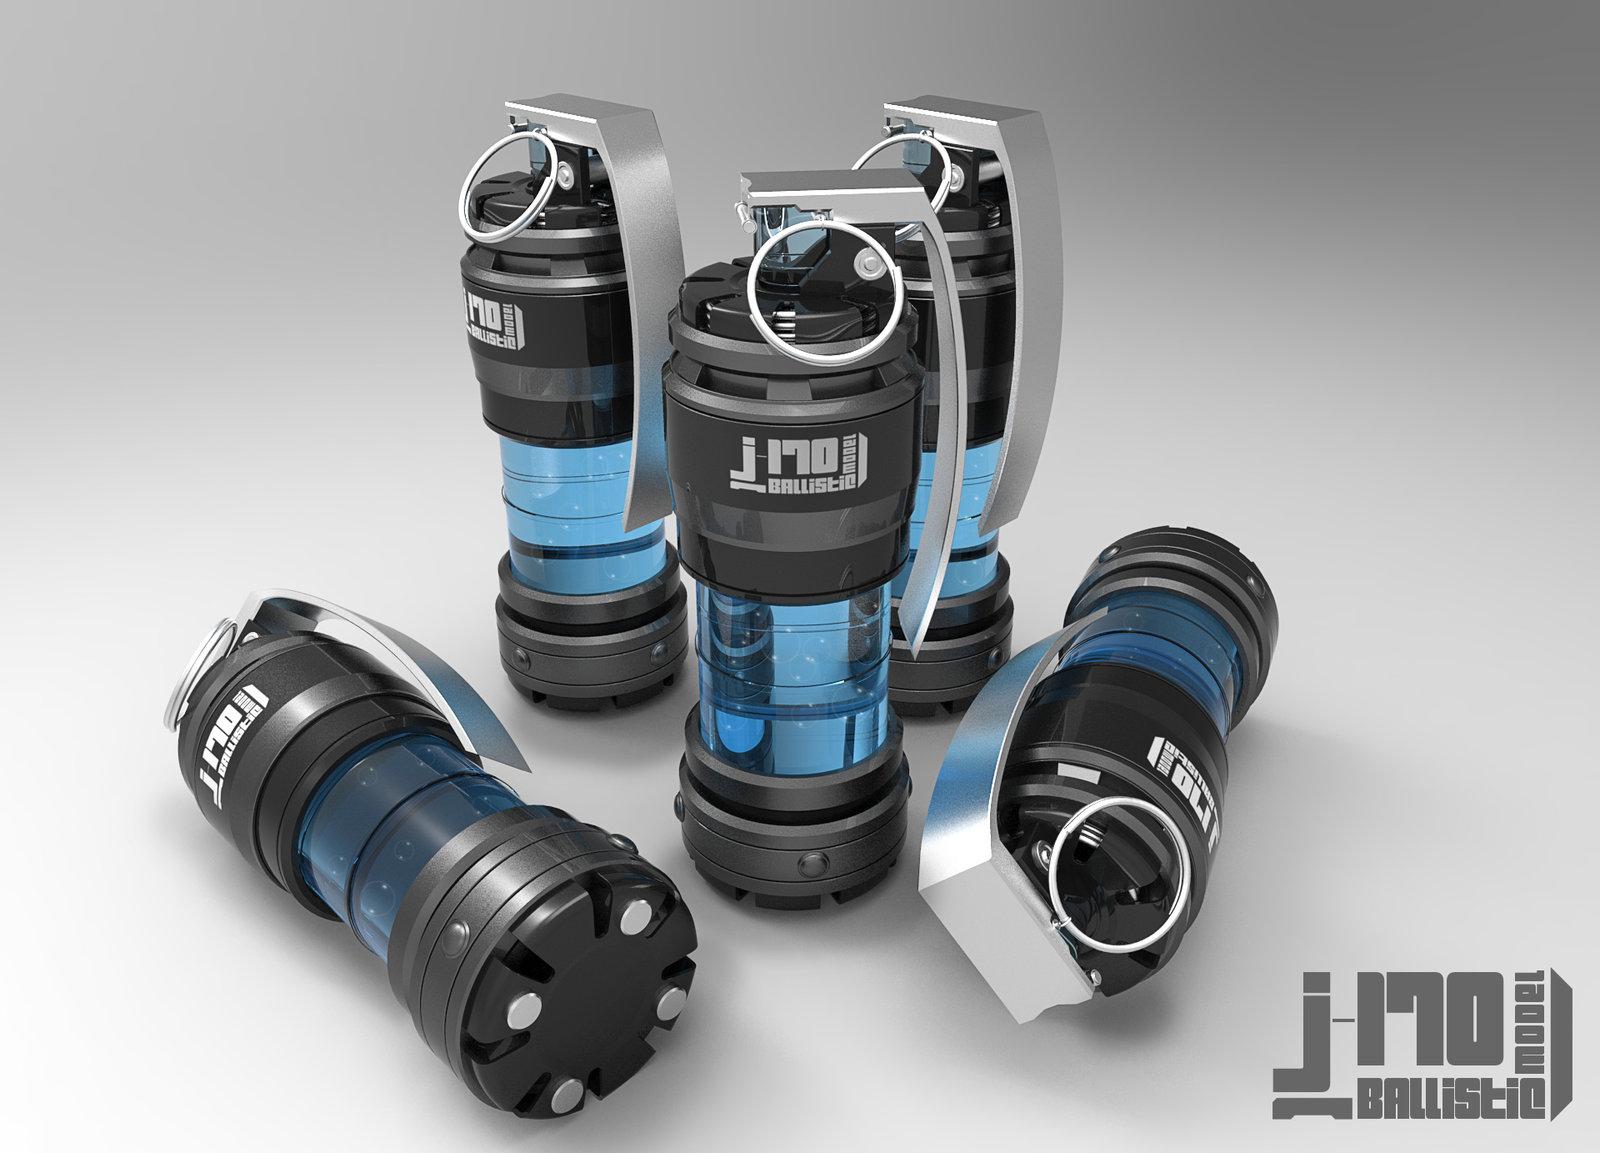 [J-170] Grenade Design